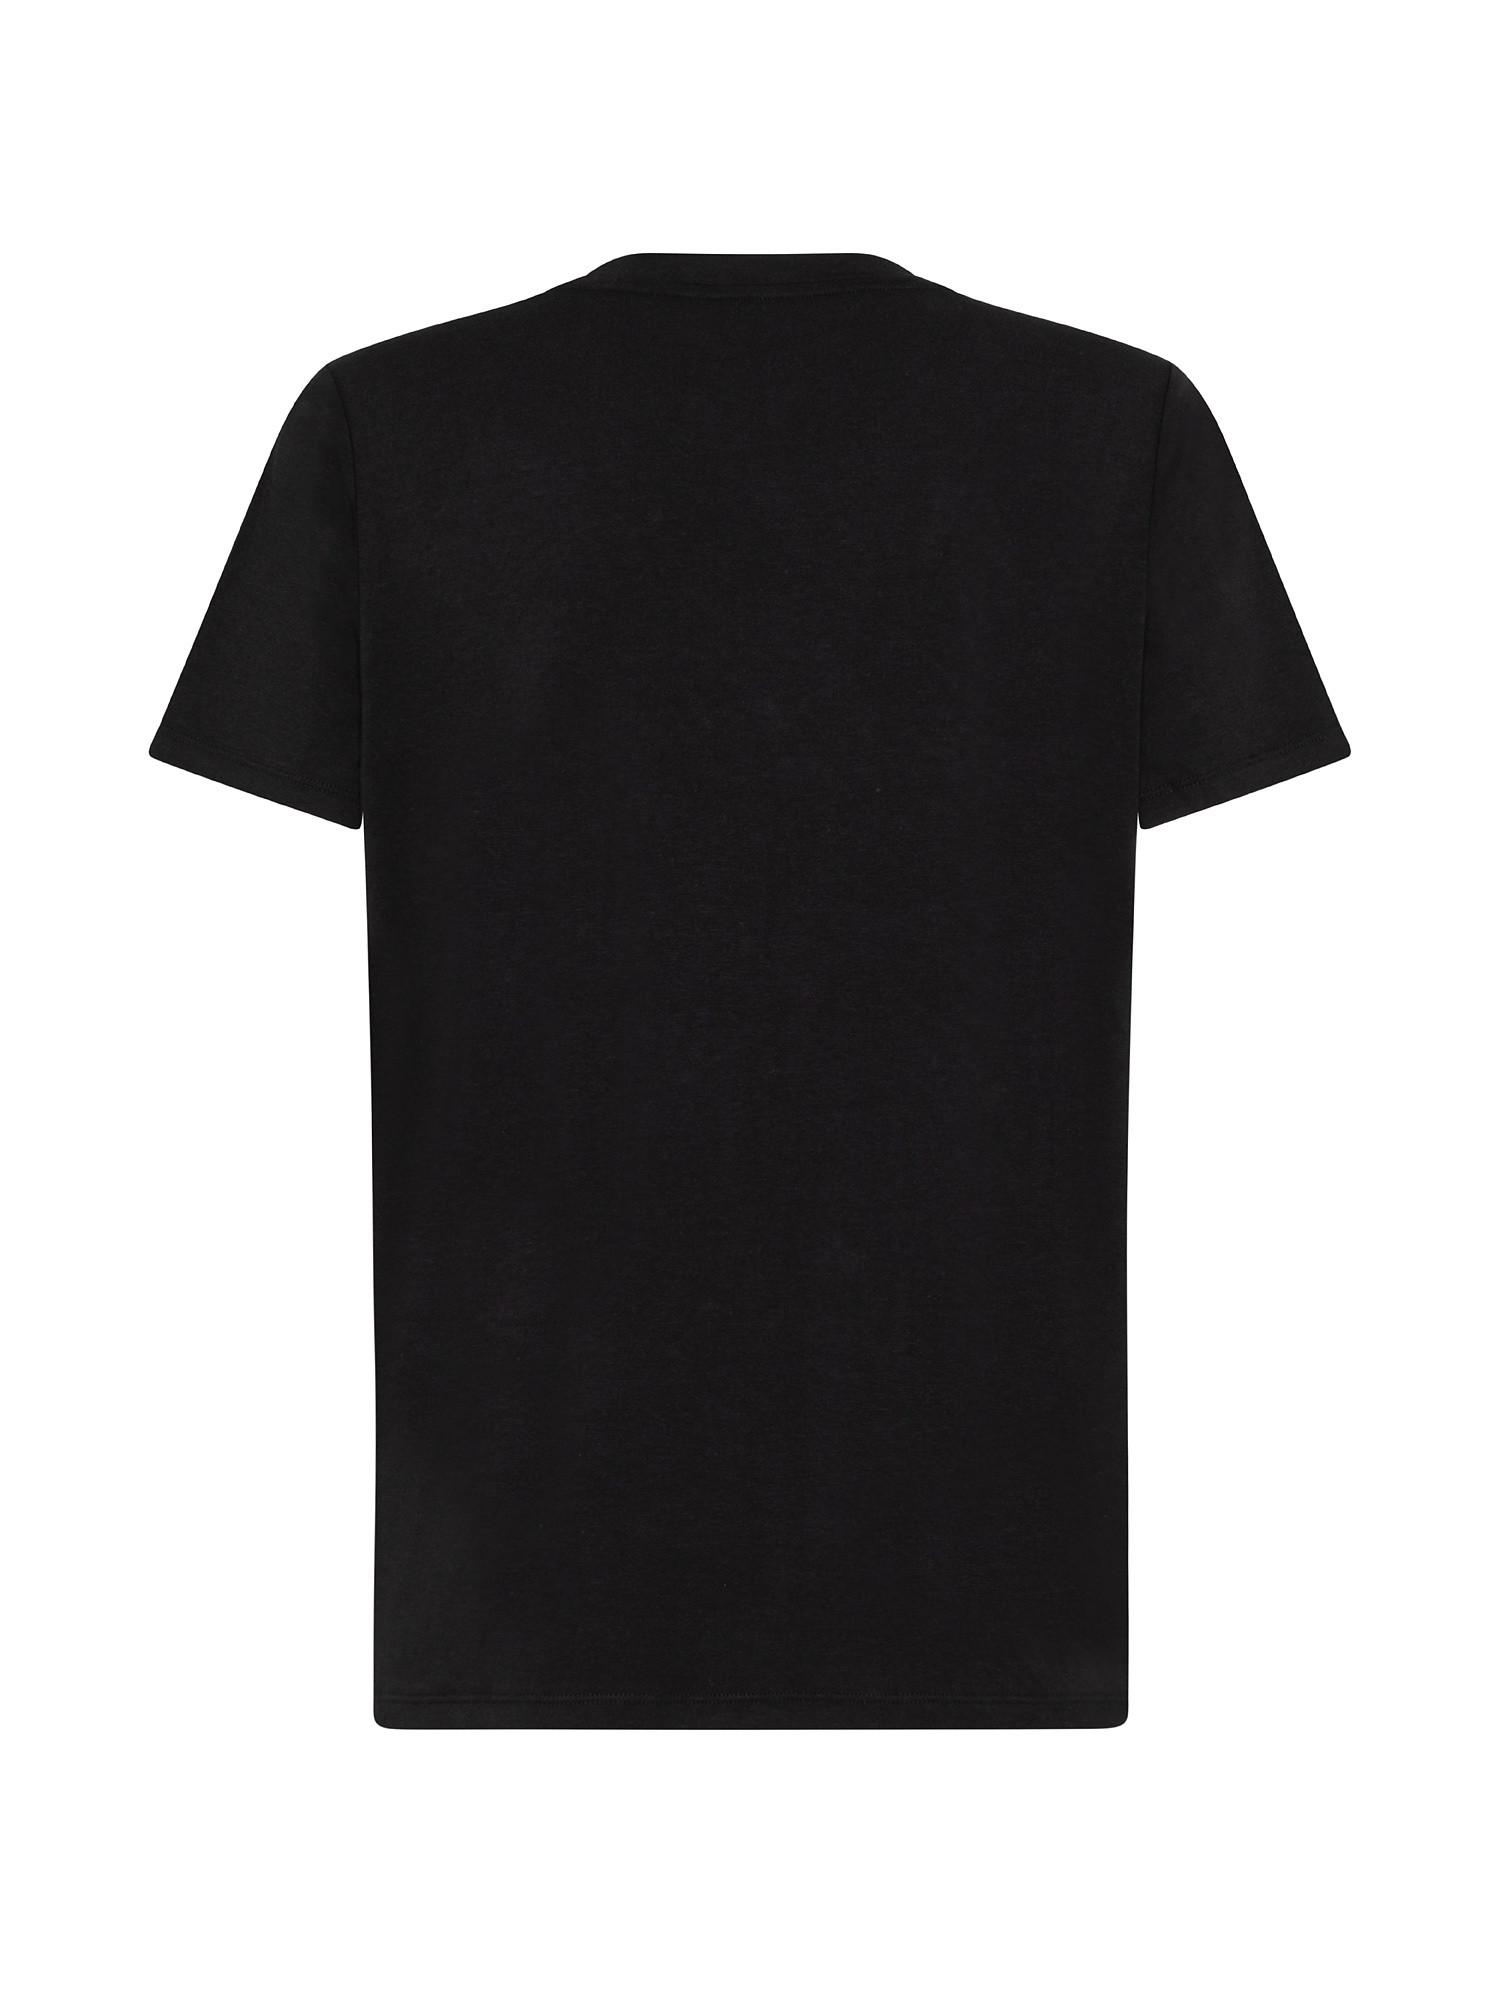 T-shirt con stripe logo, Nero, large image number 1